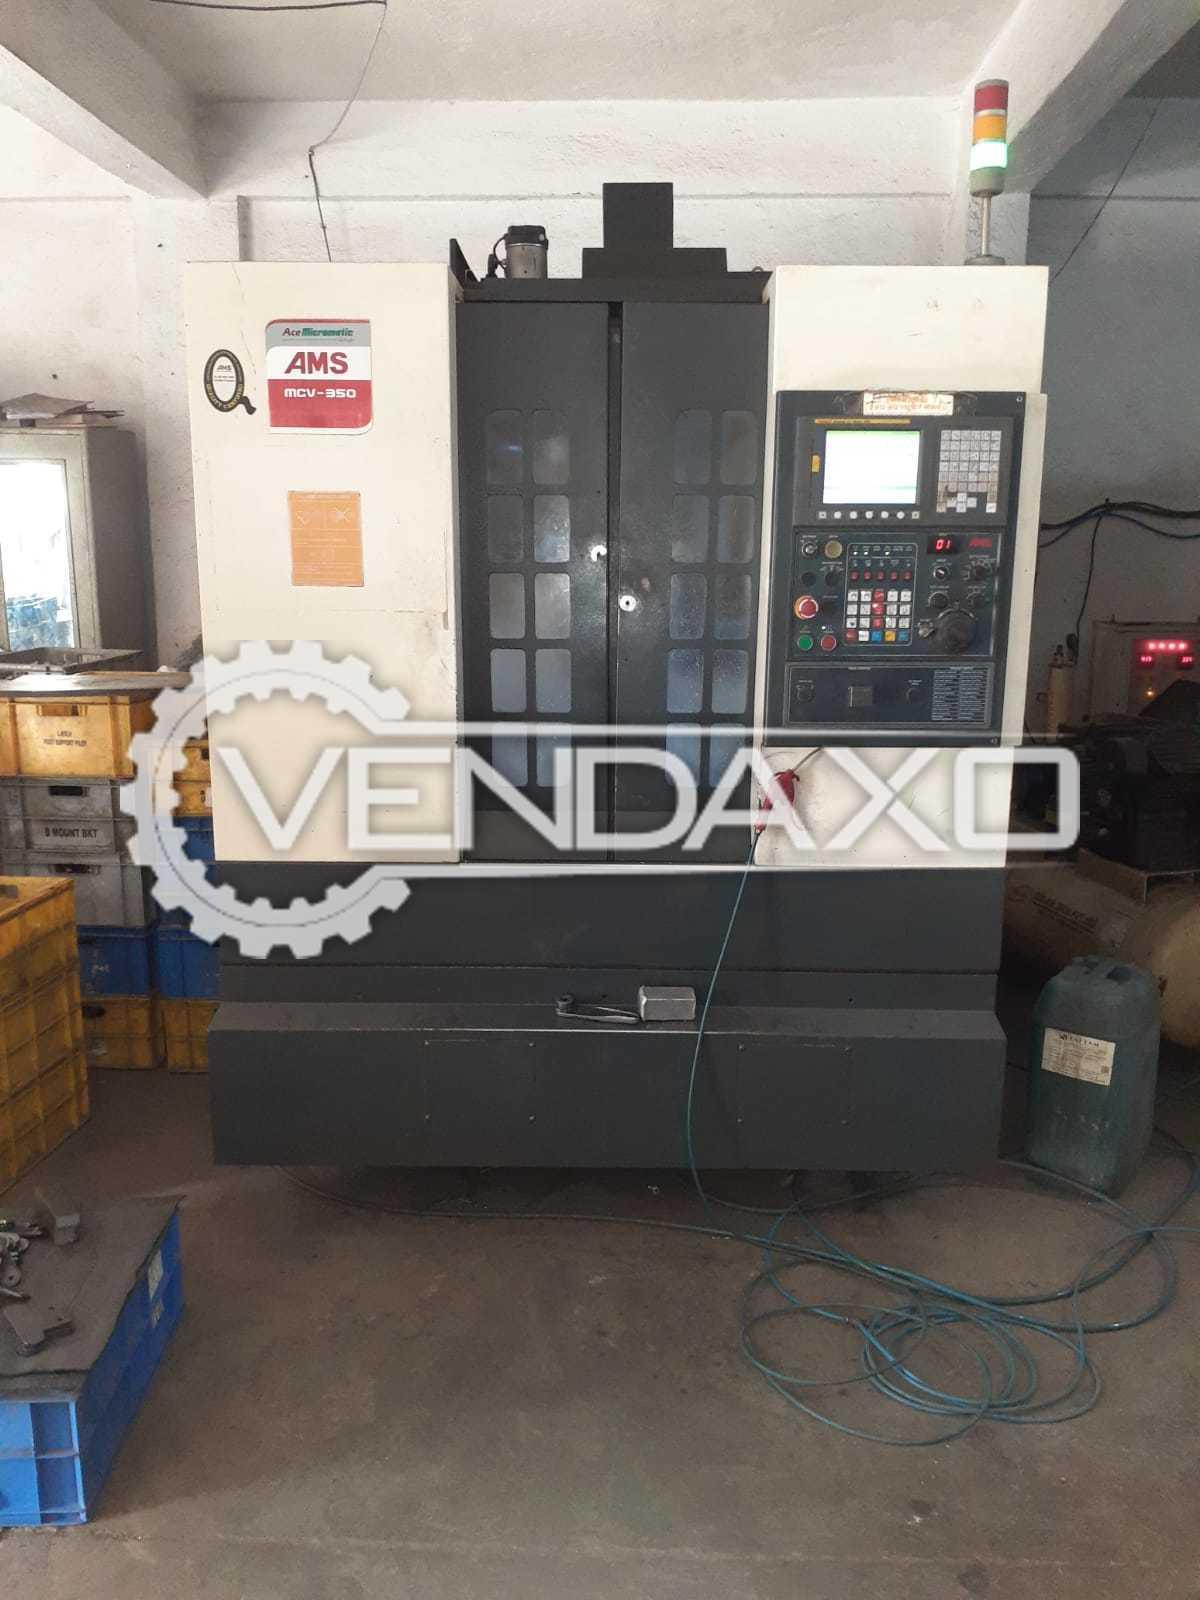 AMS MCV-350 CNC Vertical Machining Center VMC - Table Size - 650 x 350 mm